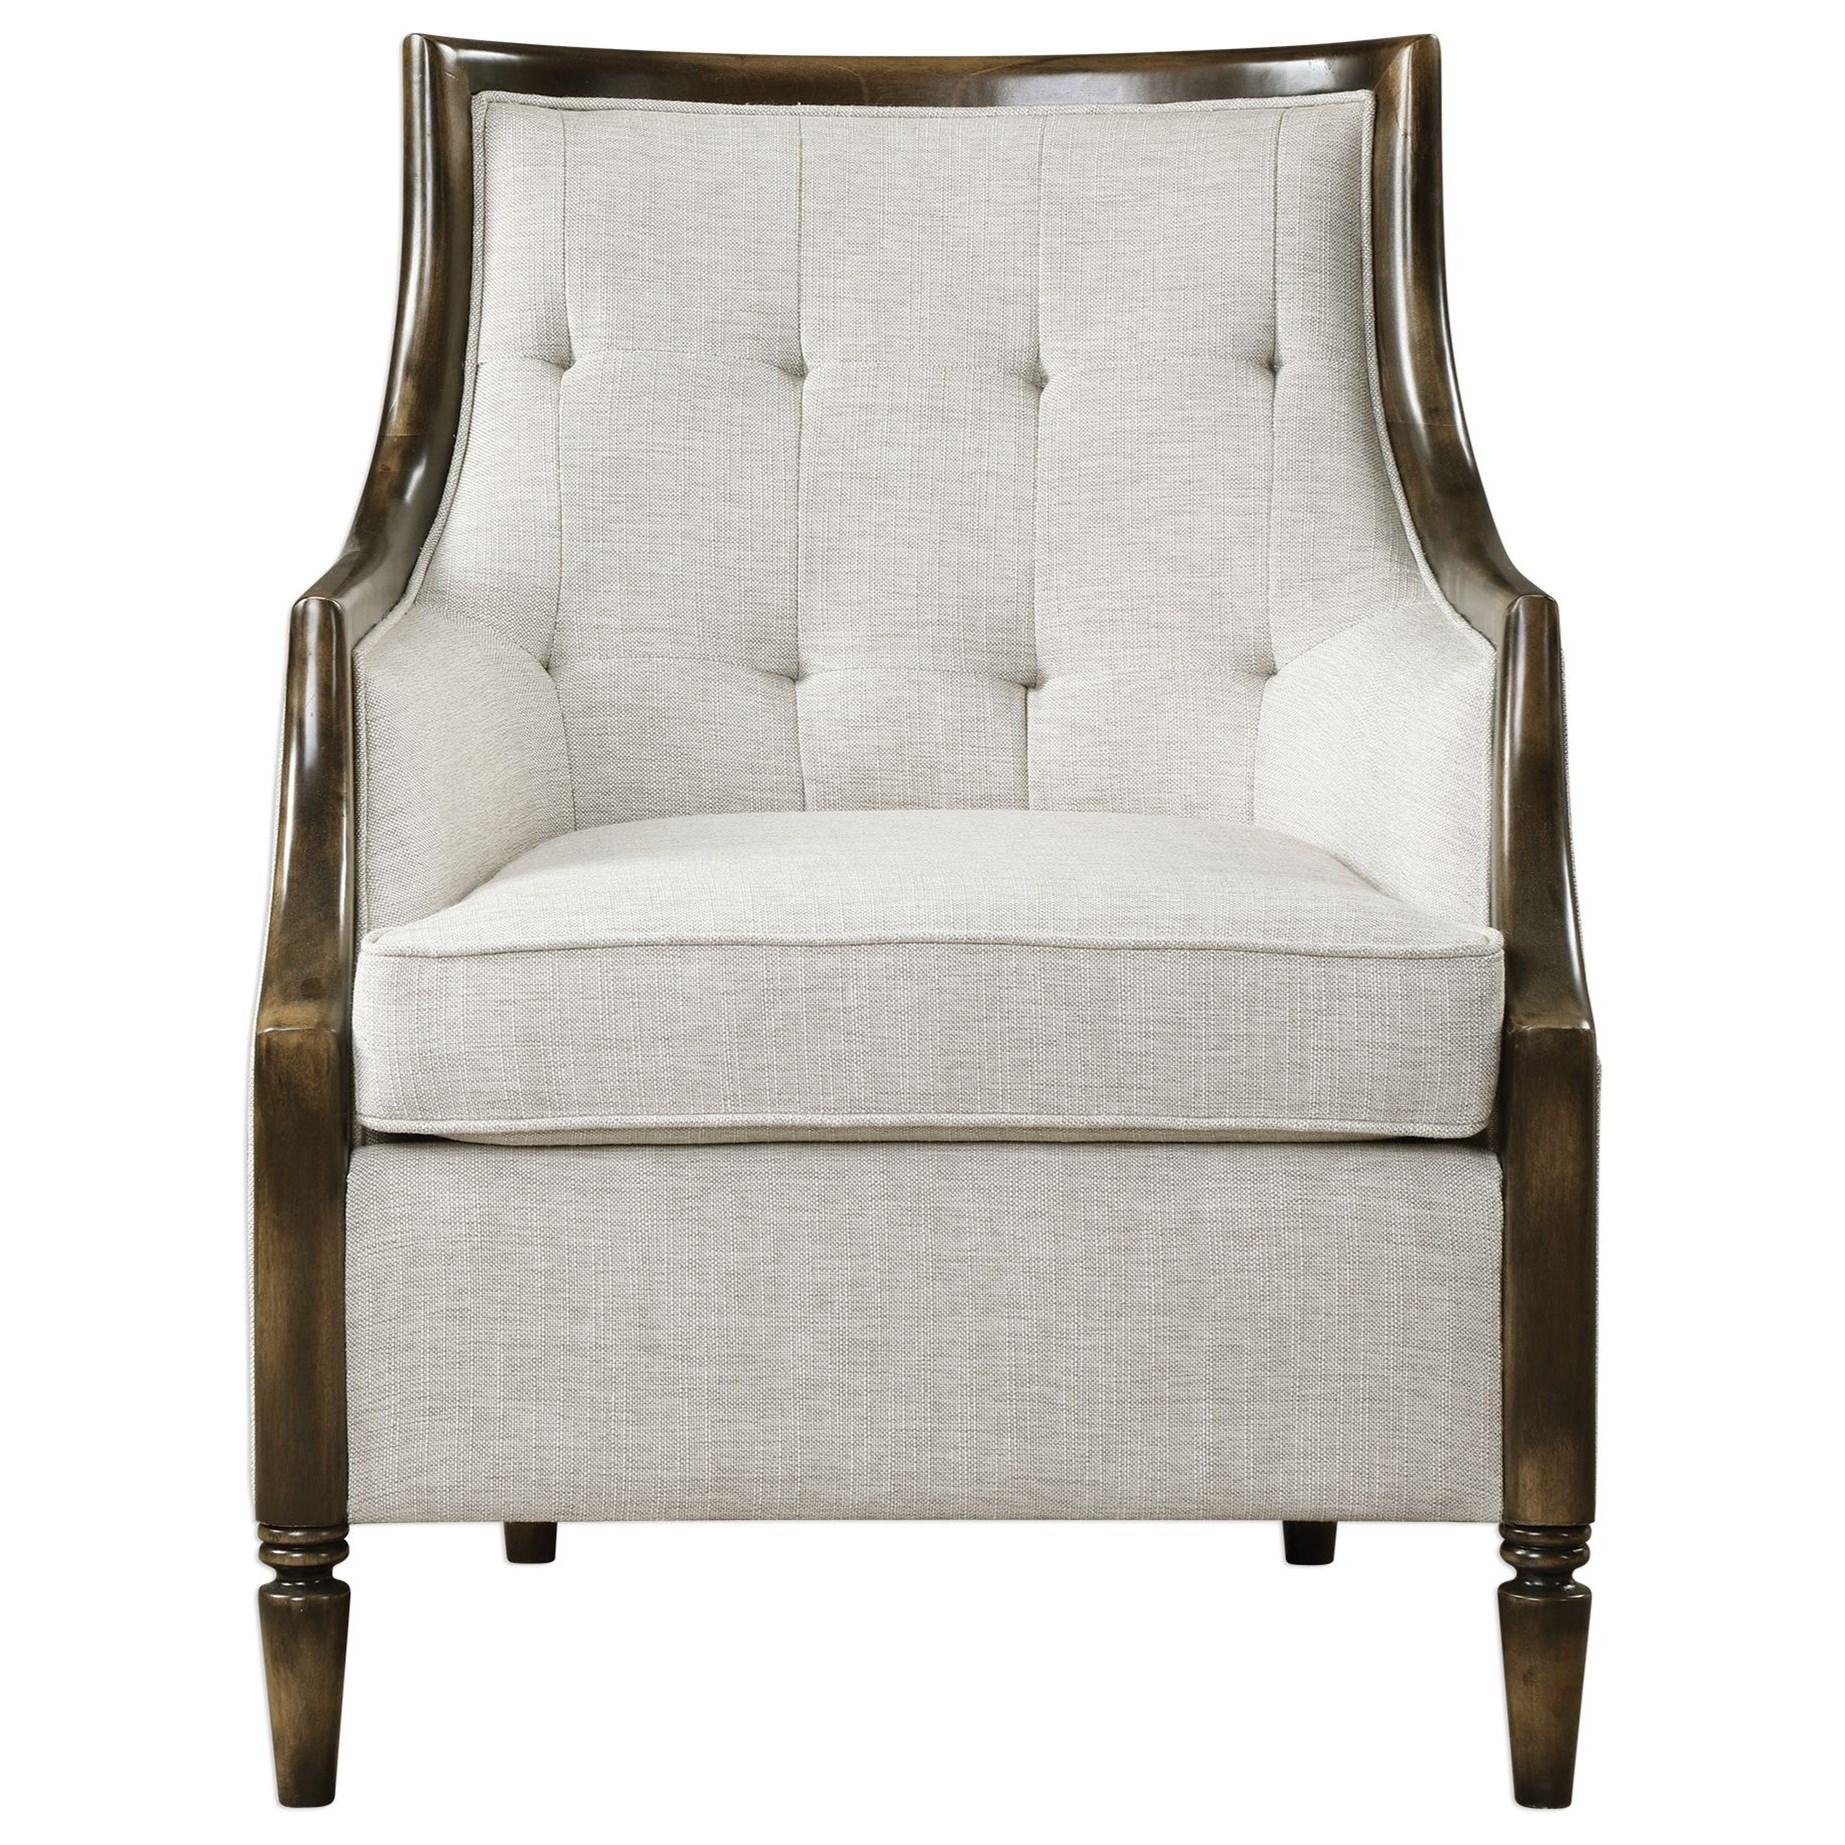 Barraud Oatmeal Accent Chair